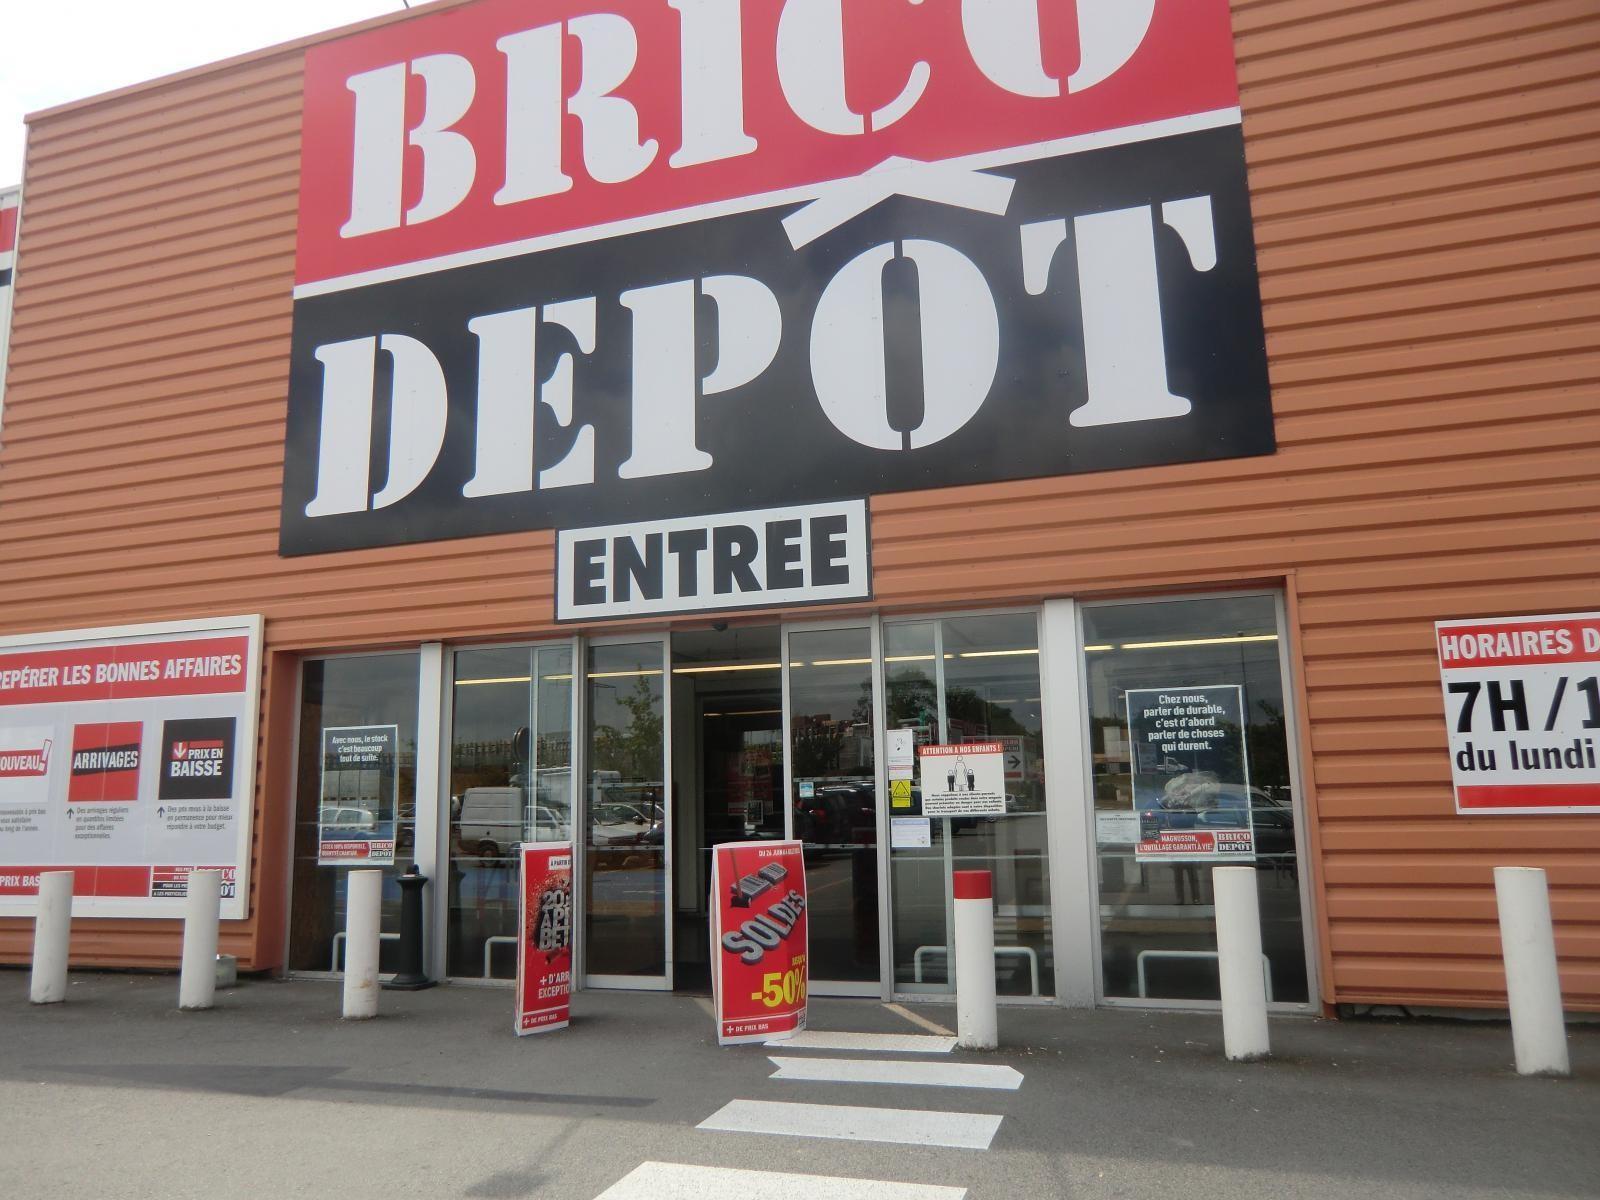 Fixation Antenne Tv Brico Depot Inspirant Photos Inspirant Brico Depot Gazon Synthetique Sweettater